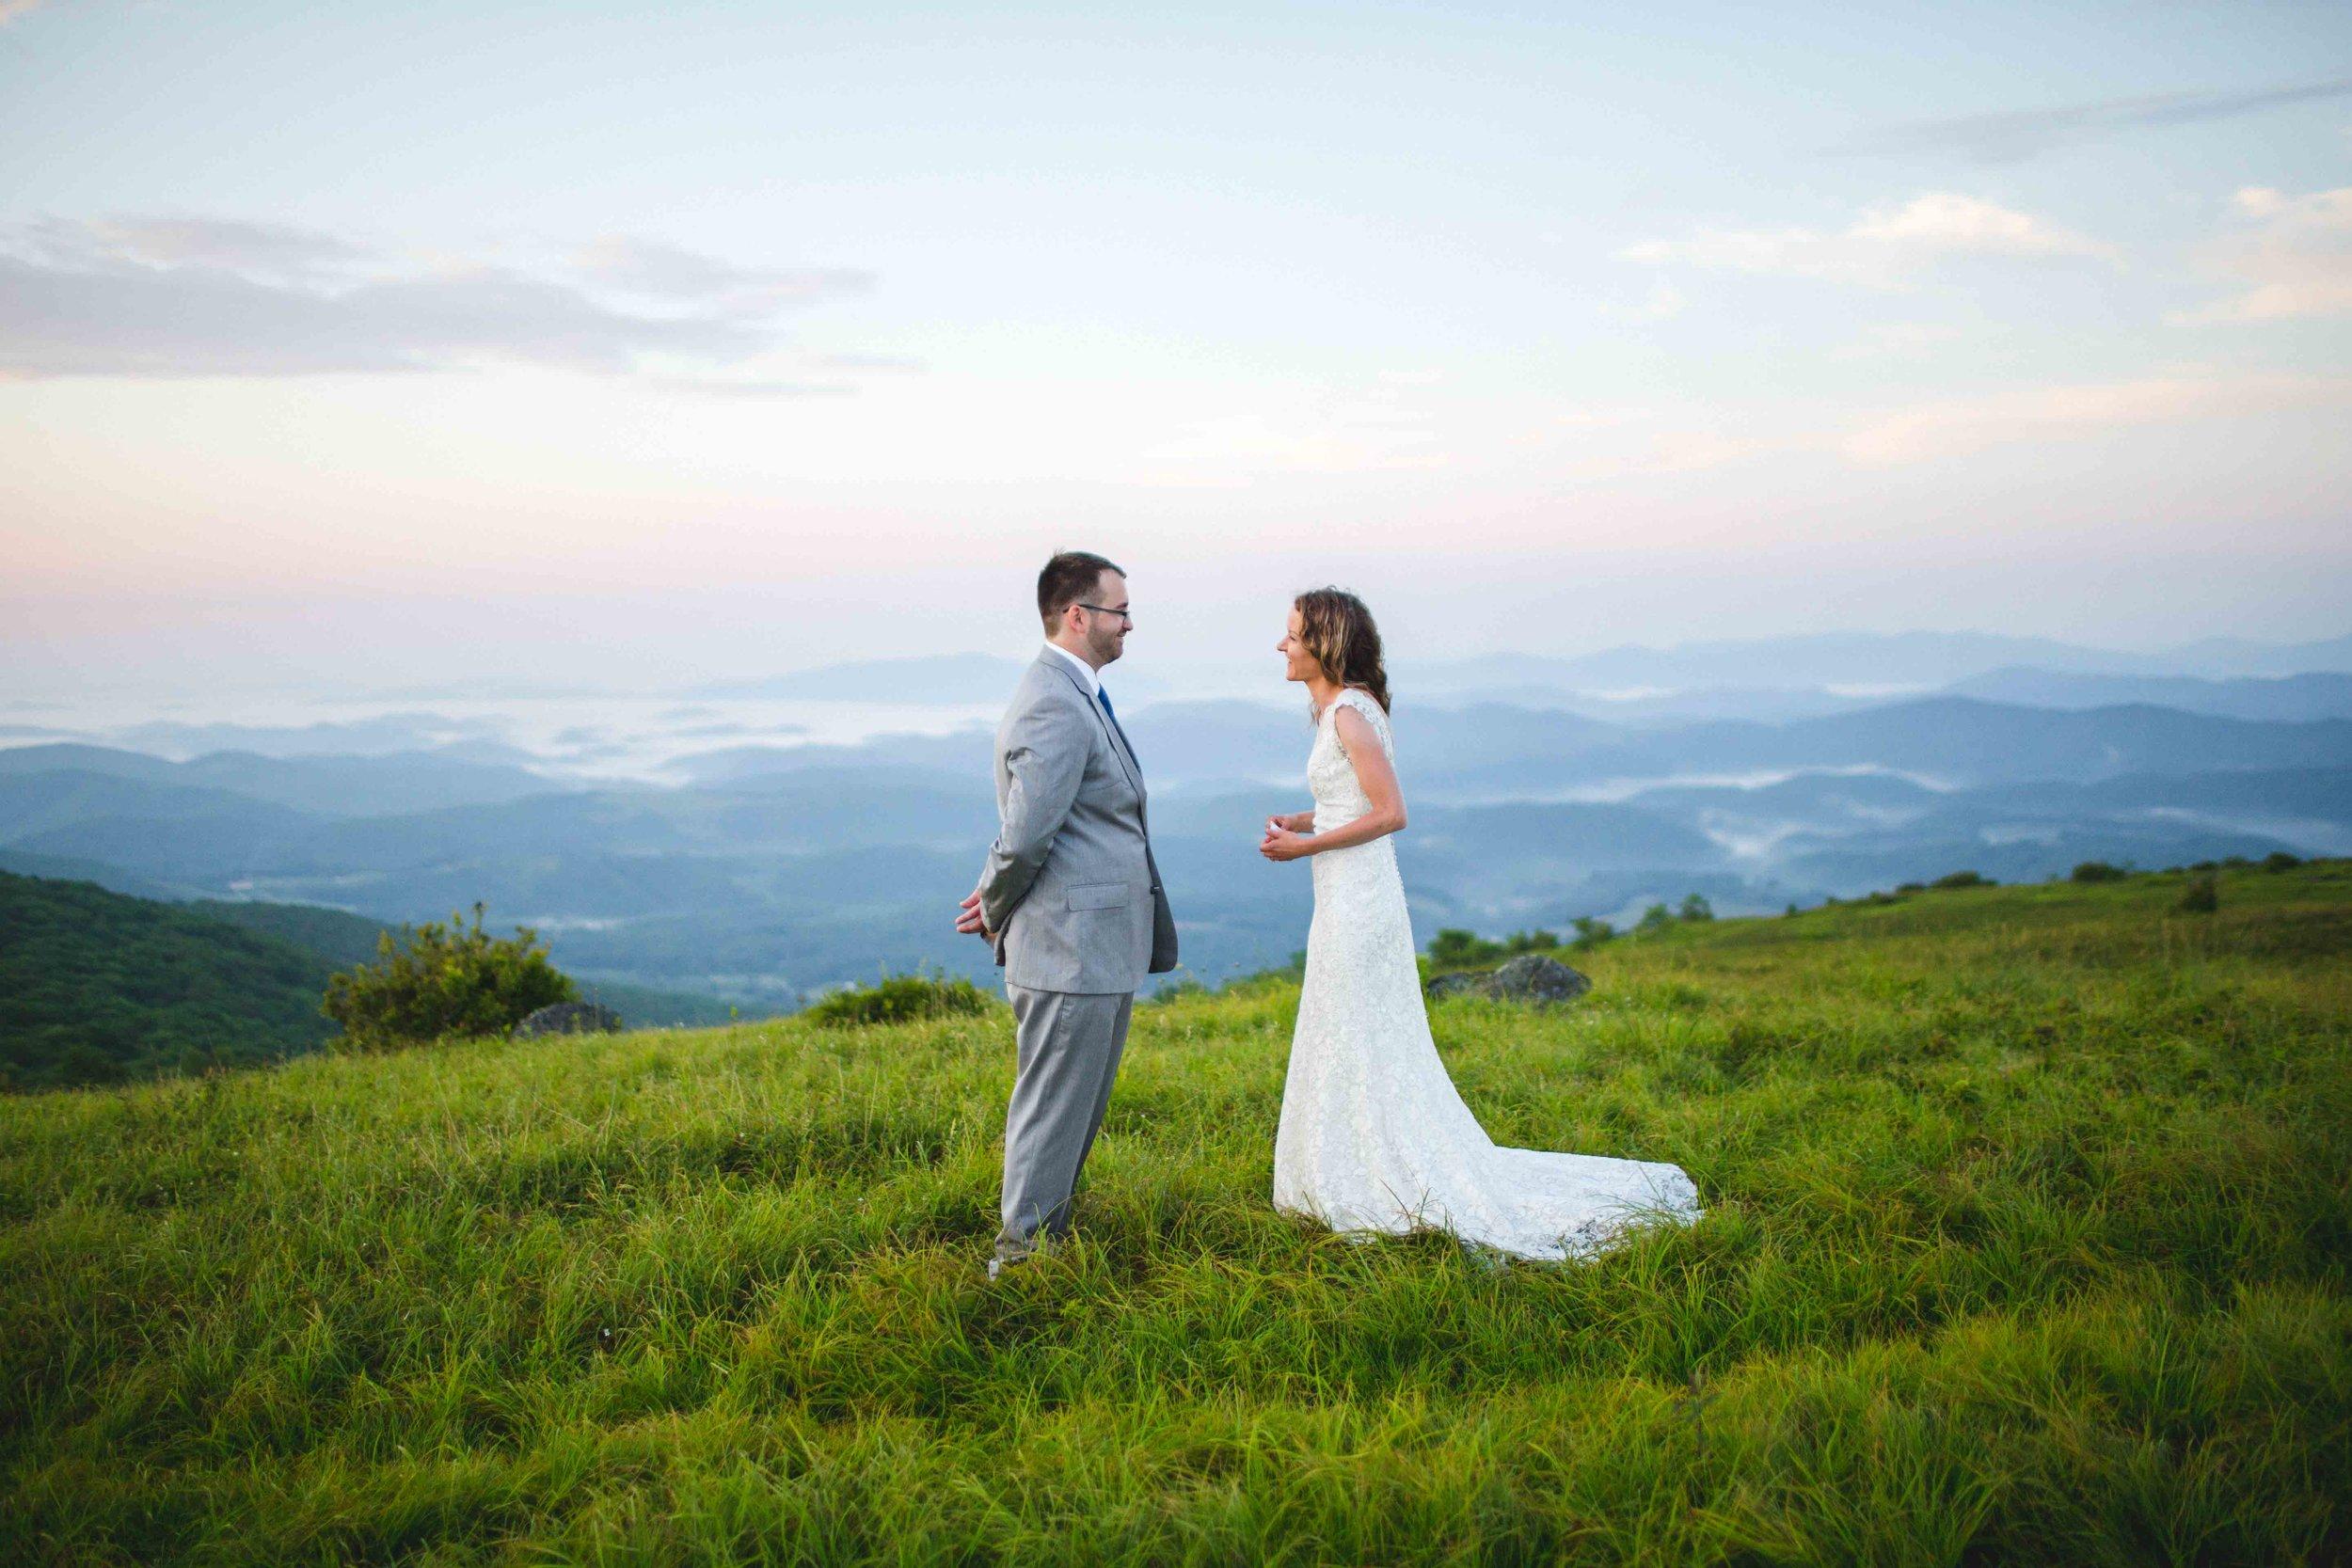 north-carolina-elopement-photographer-32.jpg